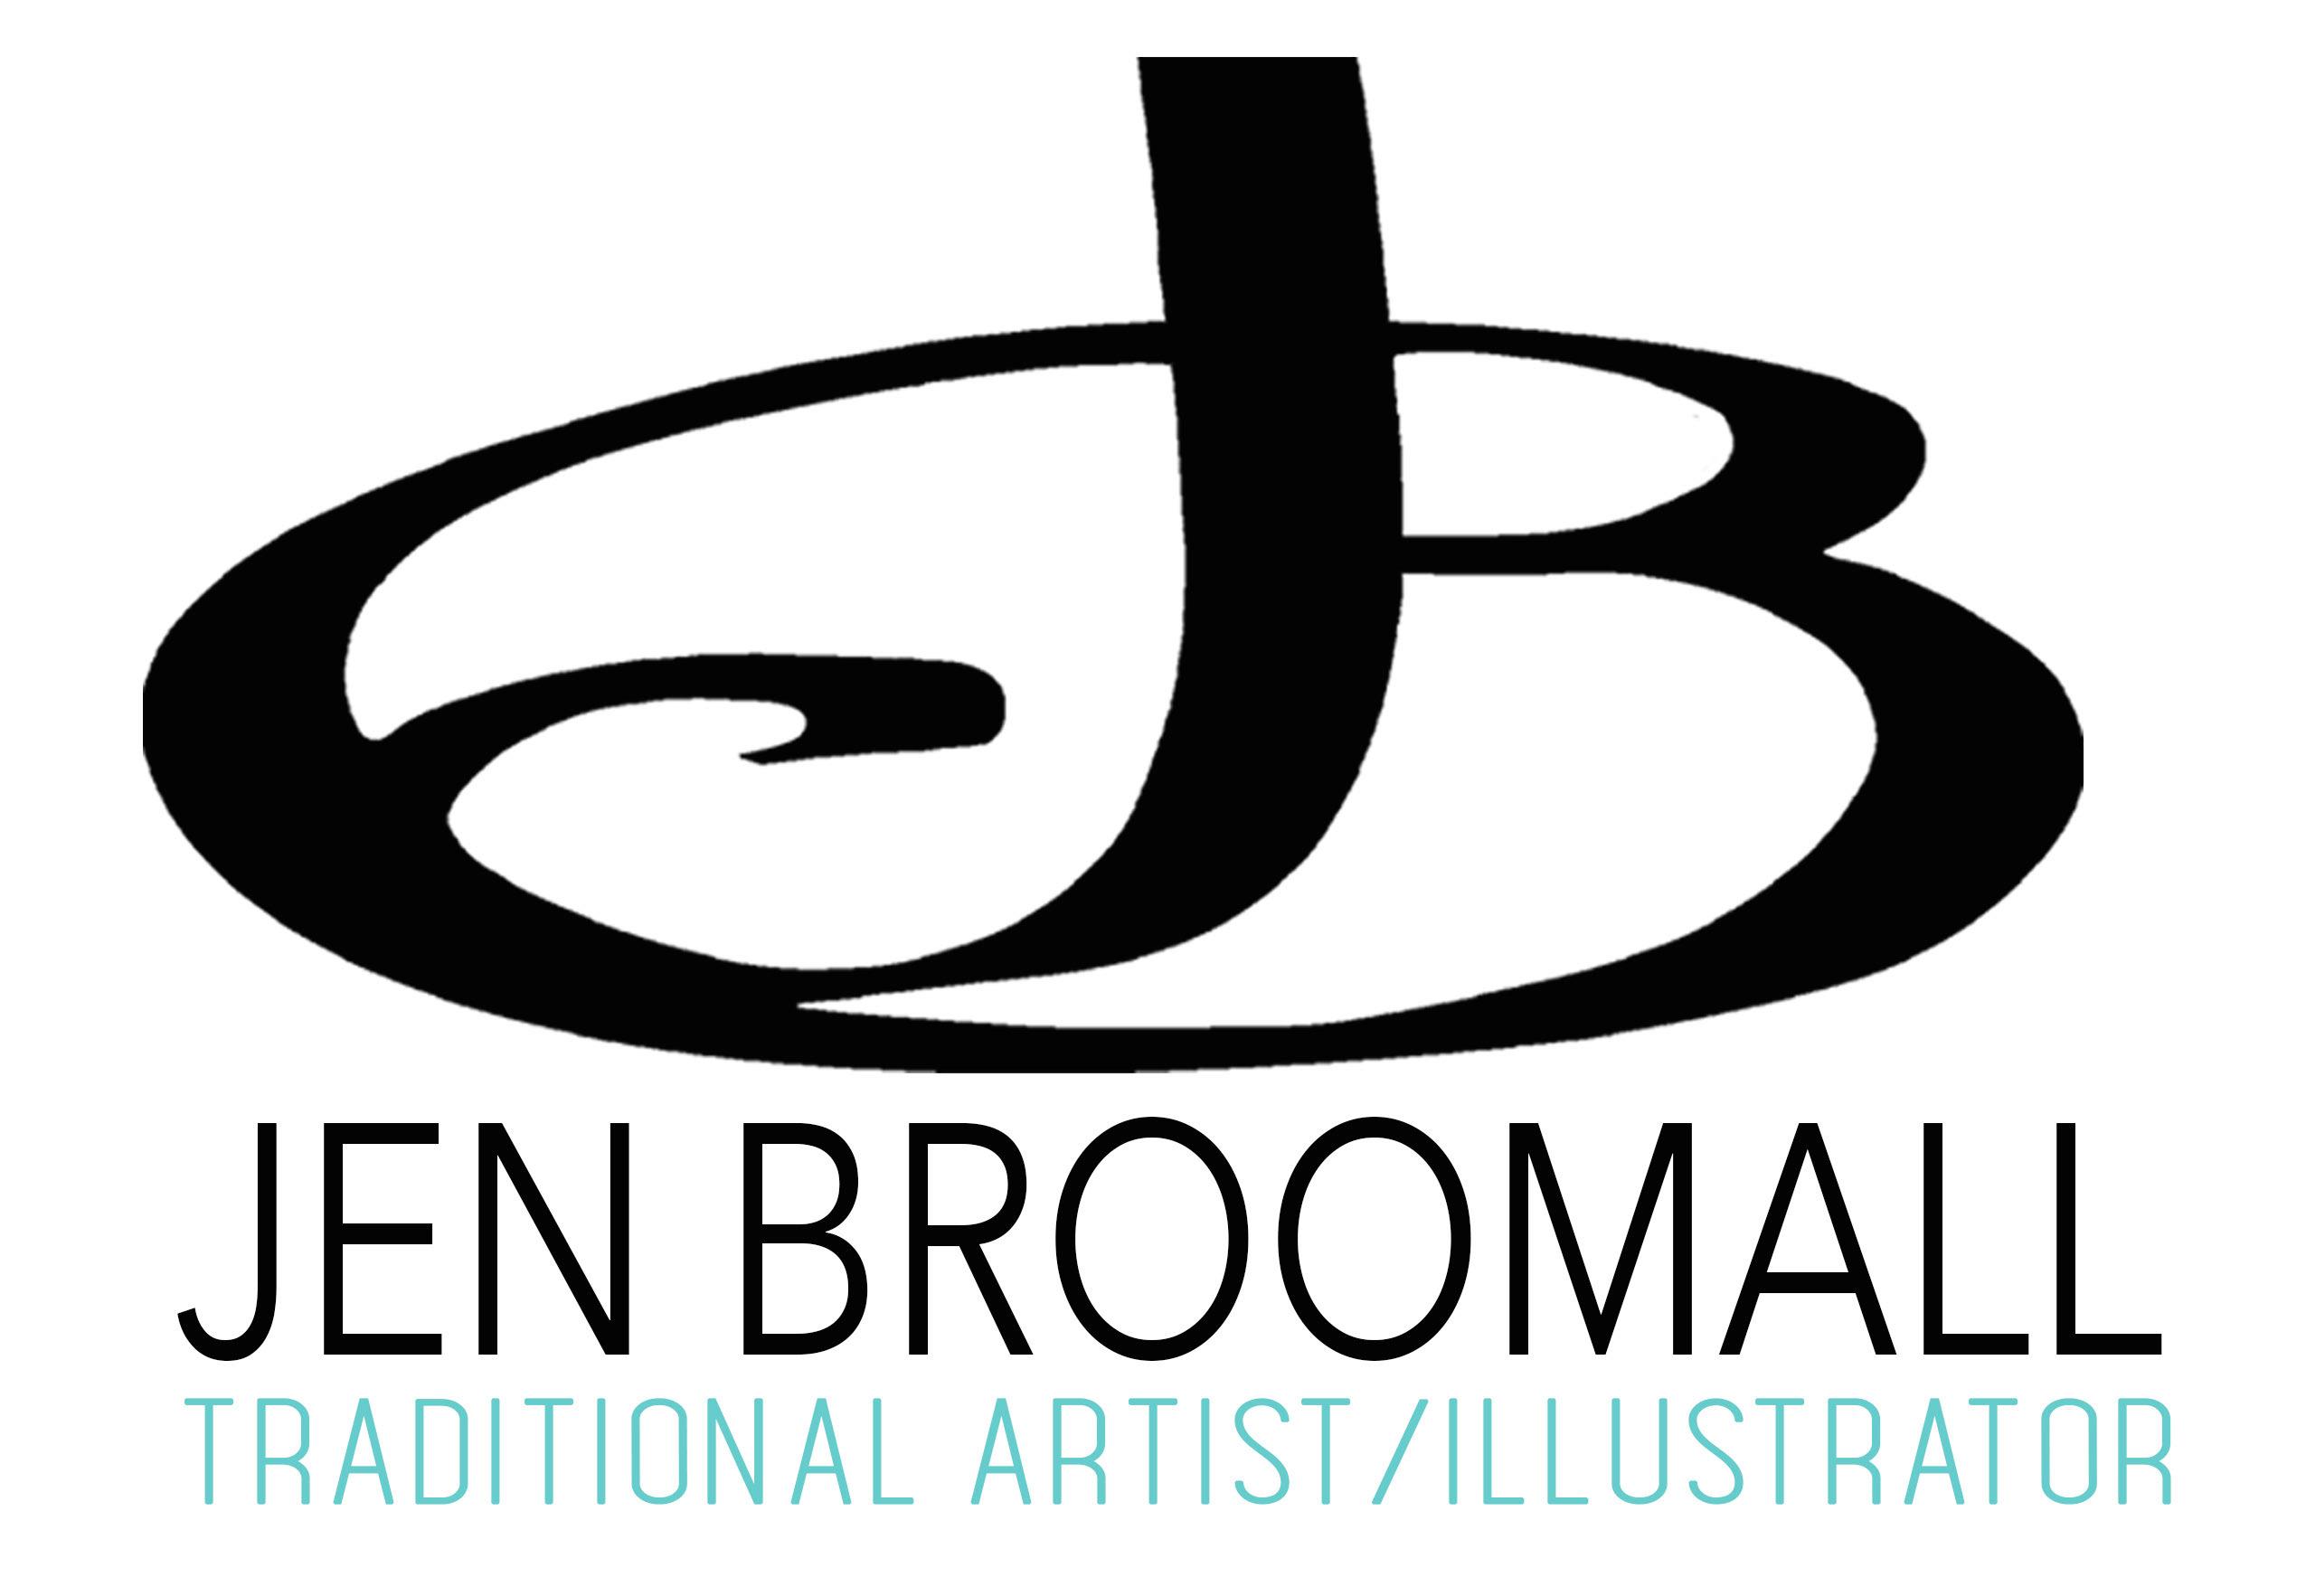 Jenevieve Broomall